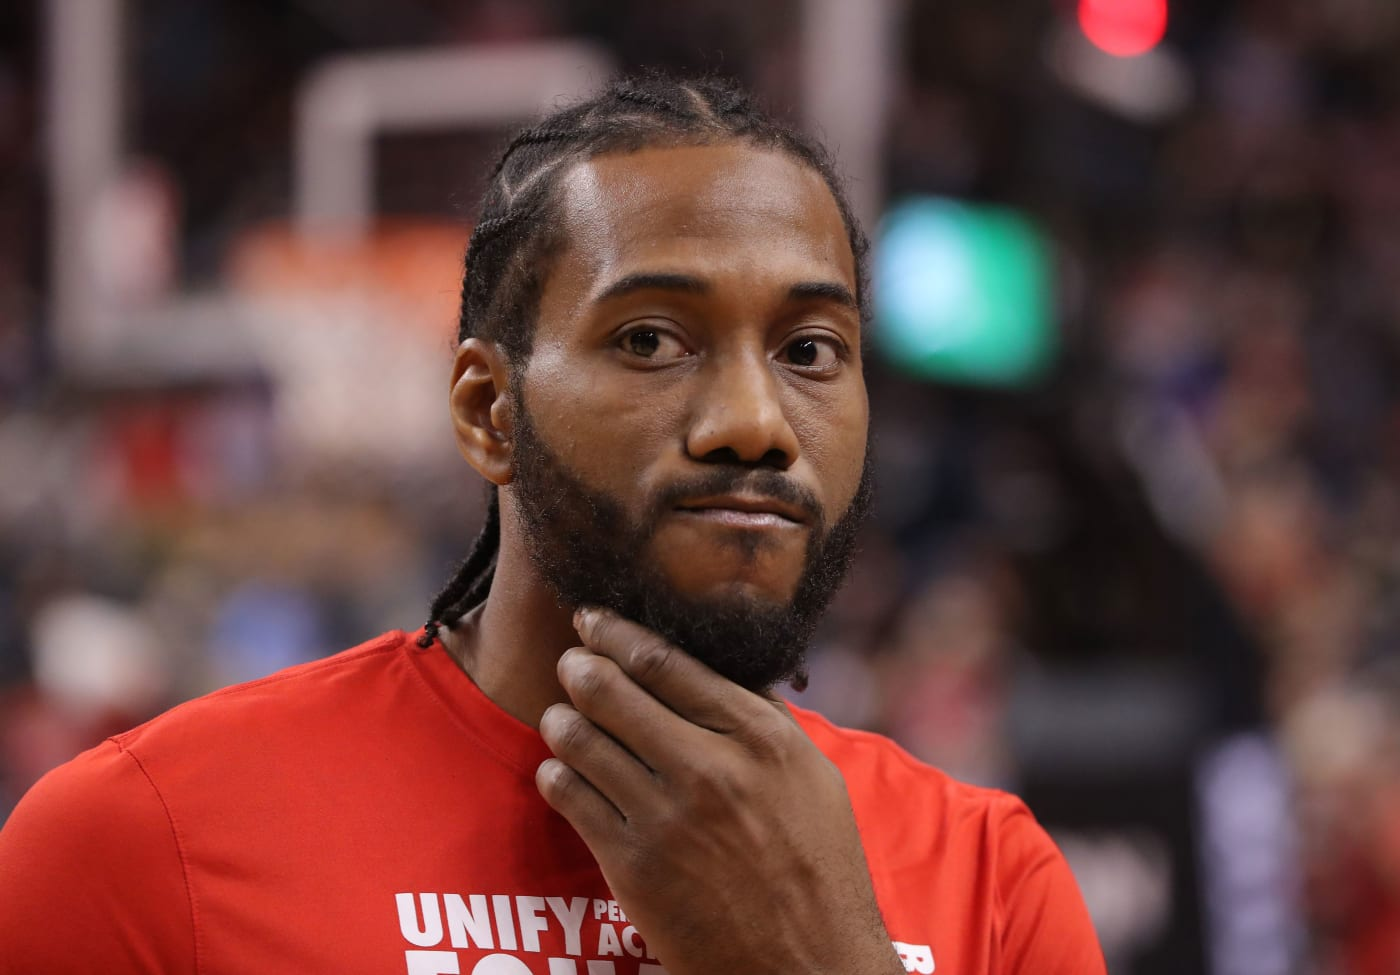 Kawhi Leonard Raptors Clippers Feb 2019